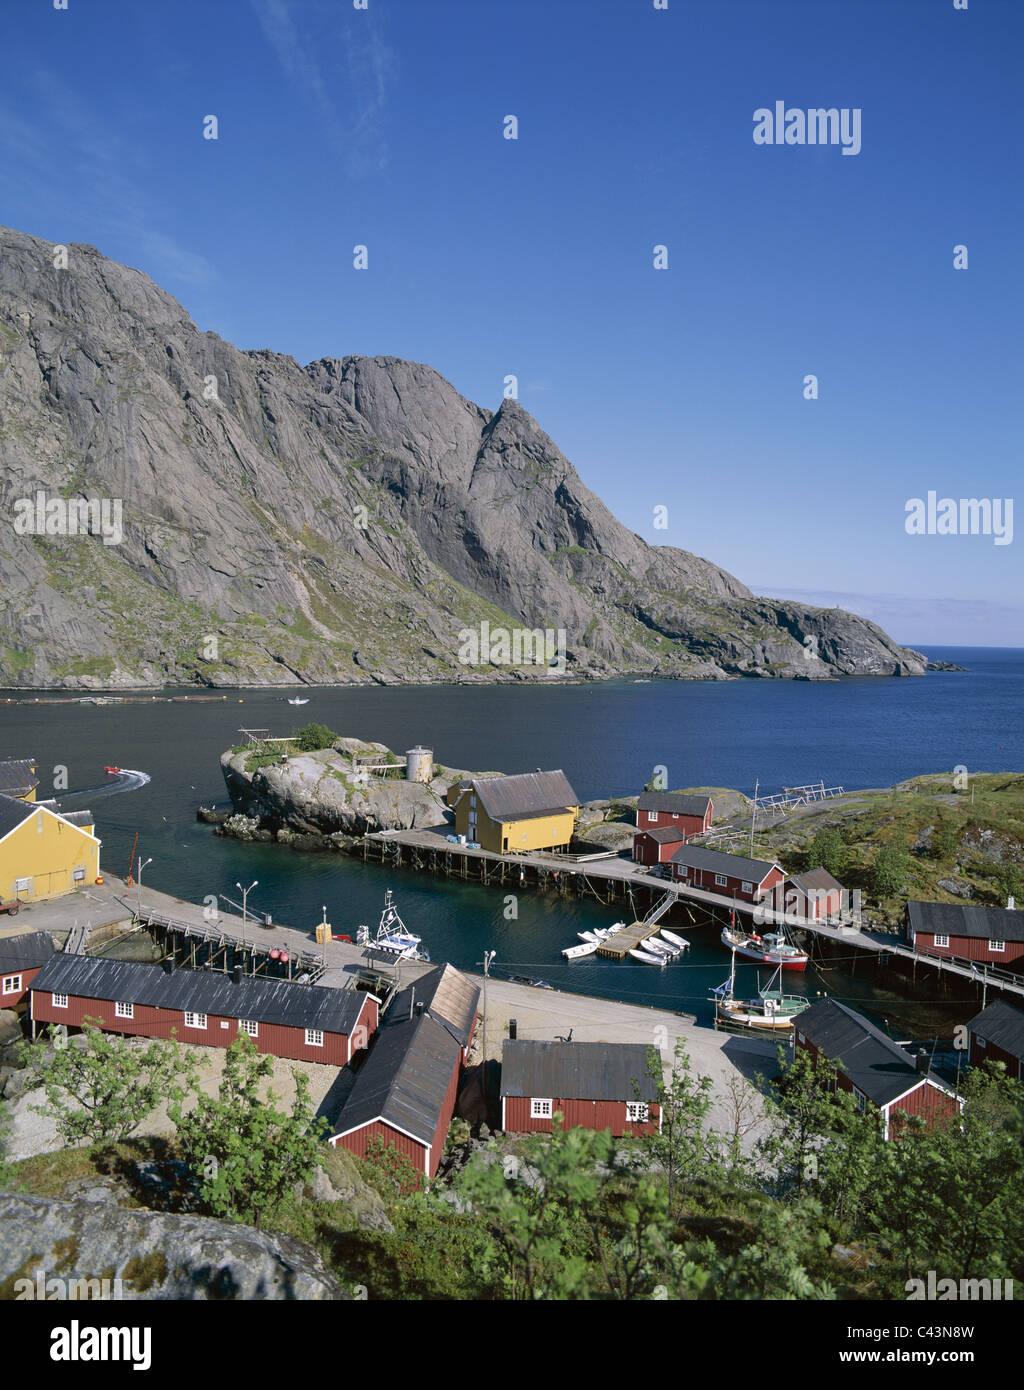 Cabins, Fisherman´s, Holiday, Islands, Landmark, Lofoten, Norway, Europe, Nusfjord, Rorbus, Tourism, Town, Travel, Stock Photo